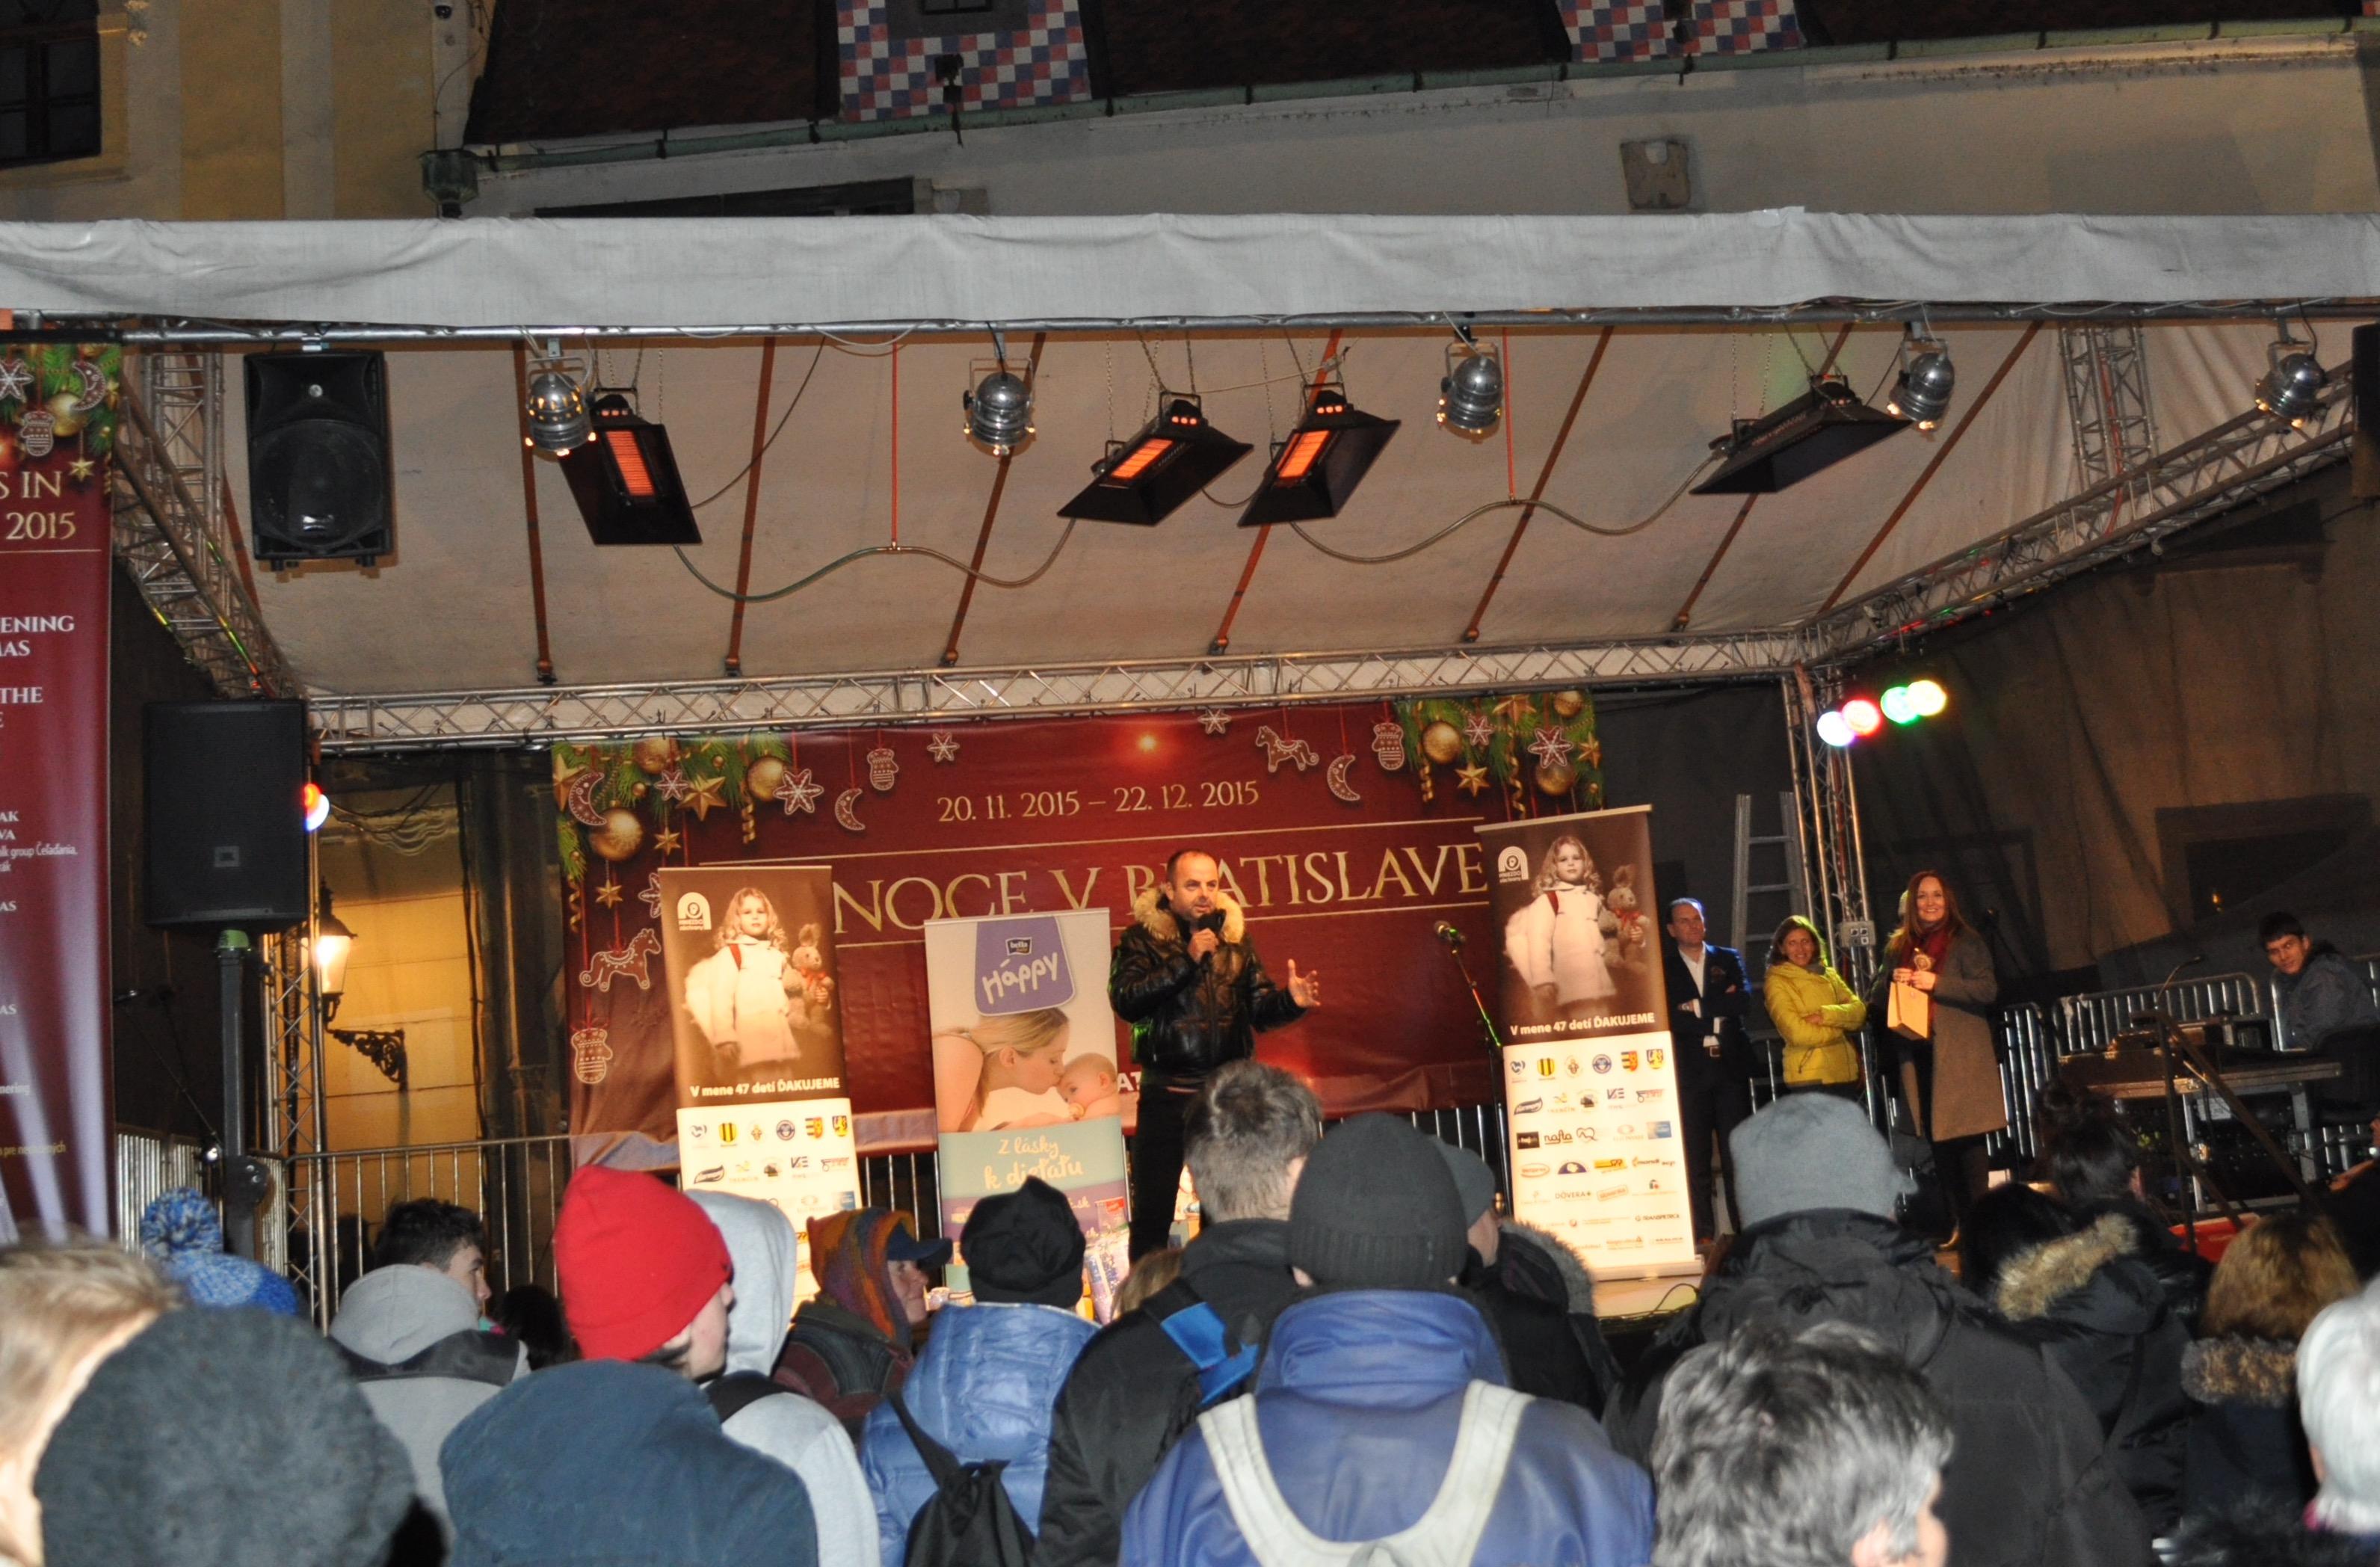 Vianocne trhy 2015. 27.novembra 2015. Bratislava